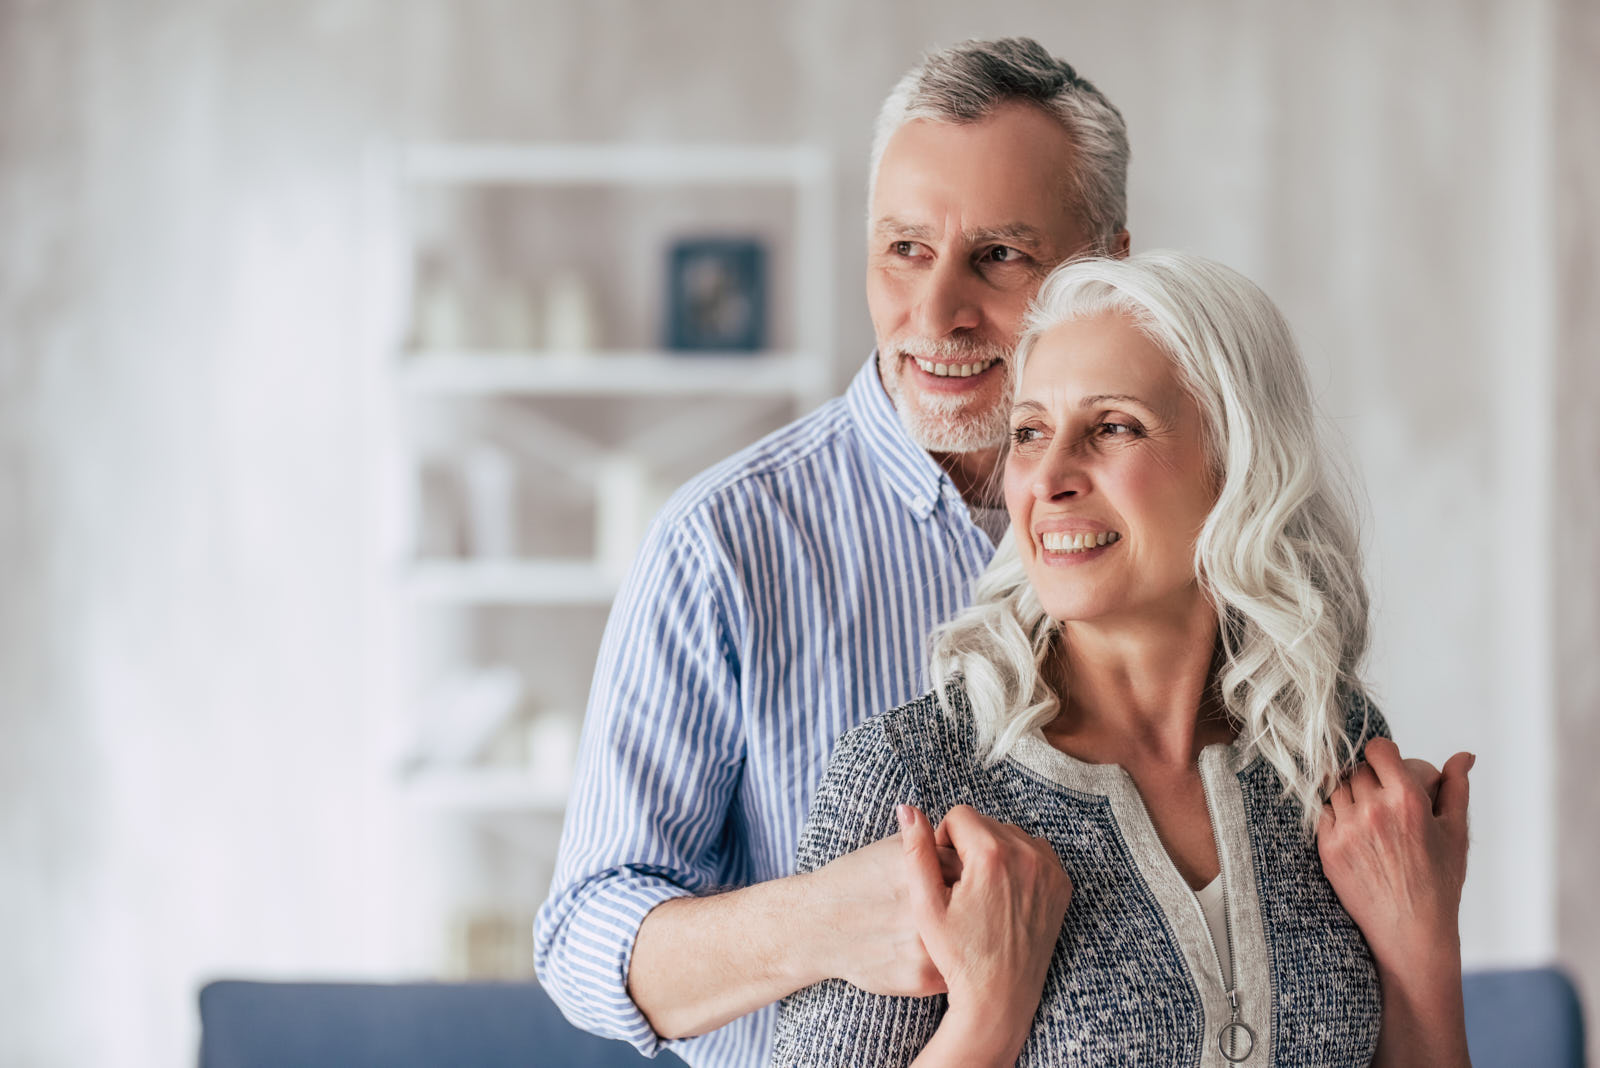 Bemerode, Ruhestandsplanung, Versicherungsmakler, Risikolebensversicherung, Finanzdienstleister, Unternehmensberatung